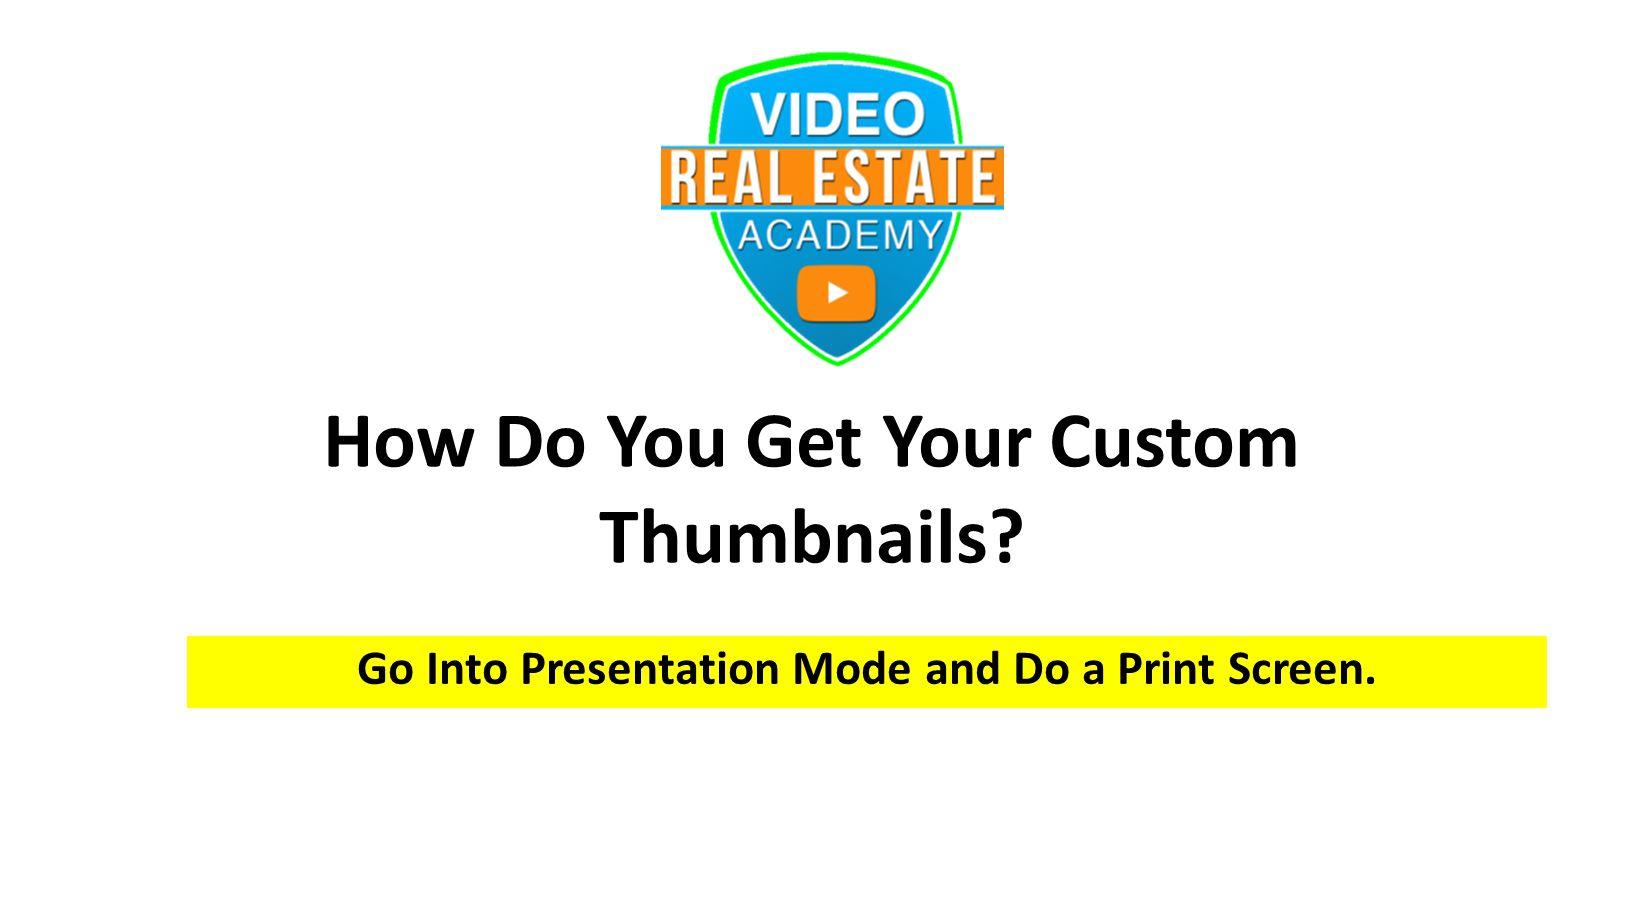 How Do You Get Your Custom Thumbnails Go Into Presentation Mode and Do a Print Screen.